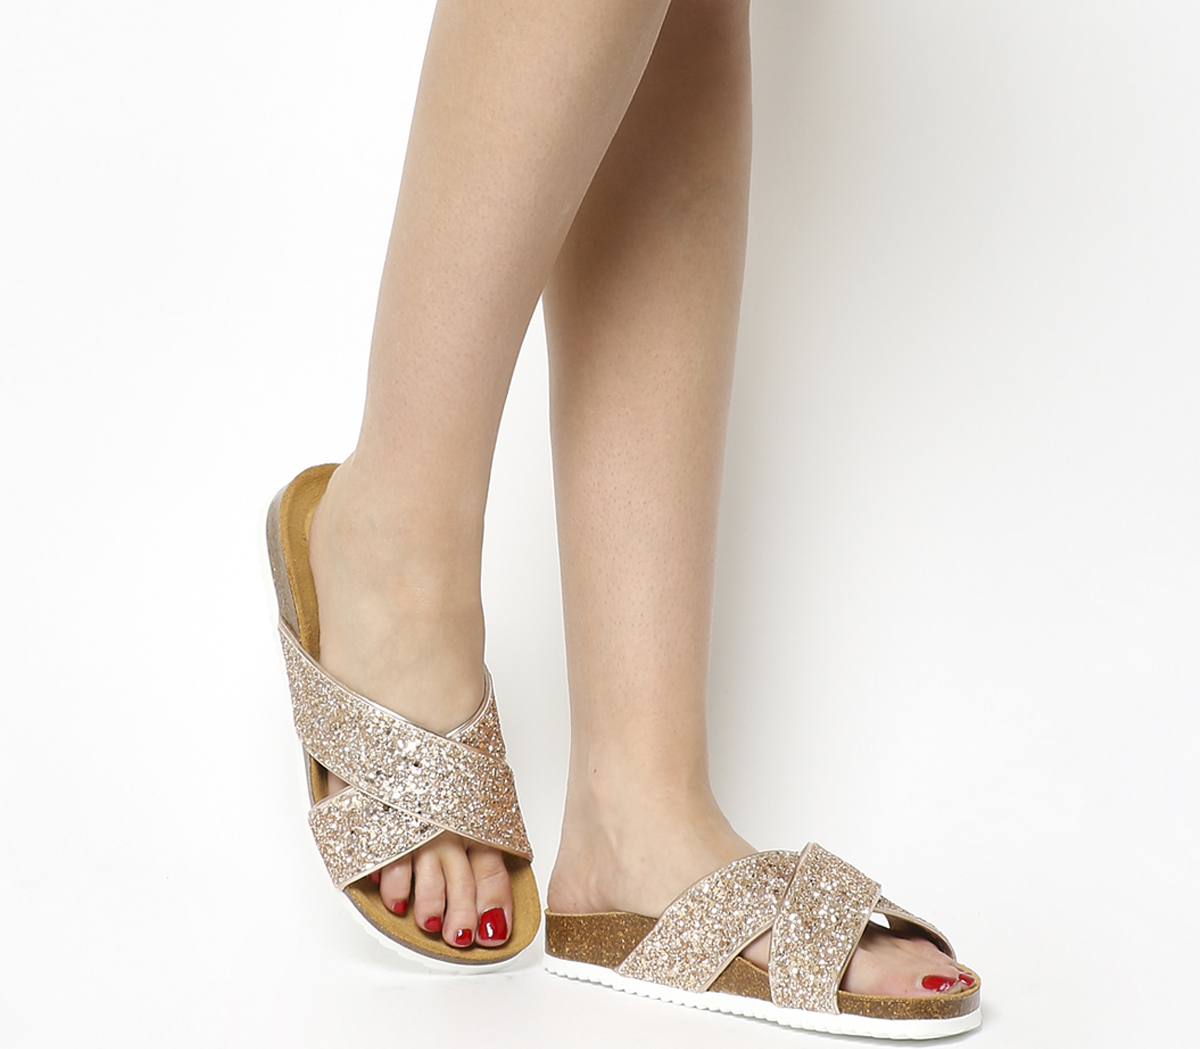 e448ebd18 Sentinel Womens Office Hoxton 2 Sandals ROSE GOLD GLITTER Sandals